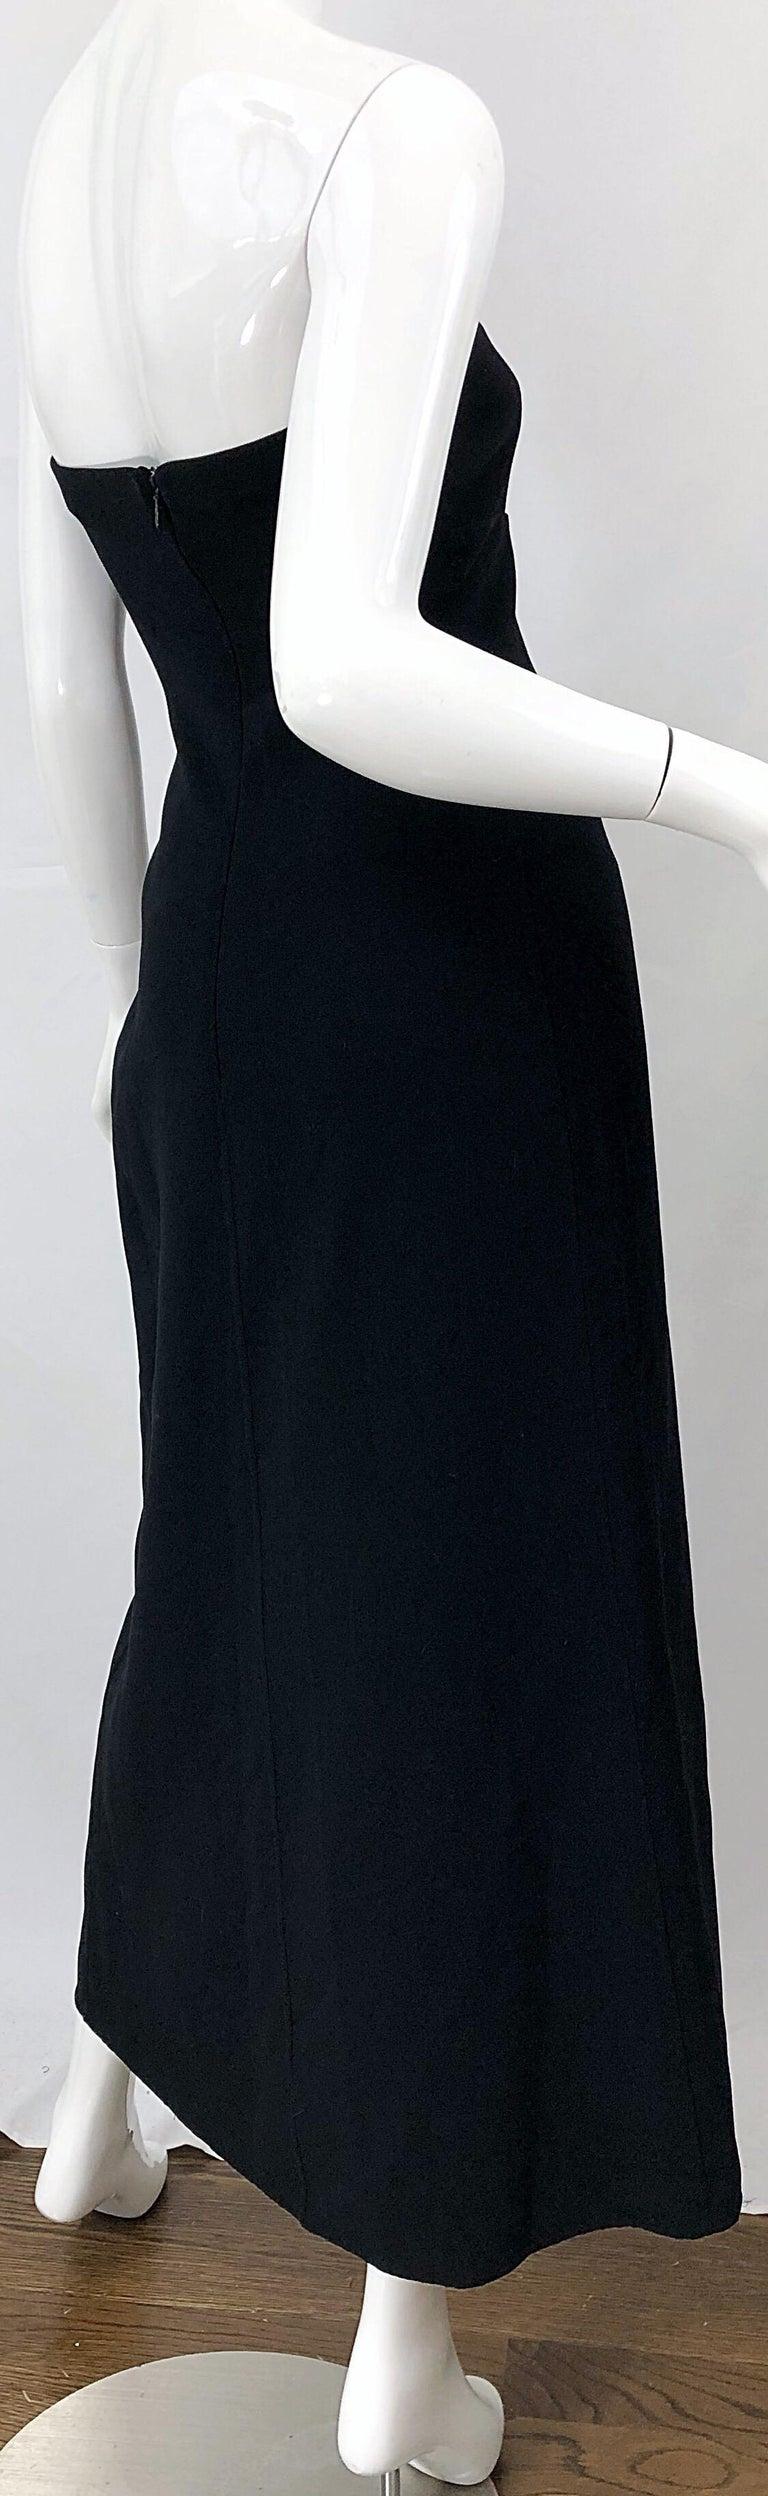 1990s Donna Karan New York Size 4 Black Strapless Vintage 90s Gown Maxi Dress For Sale 7